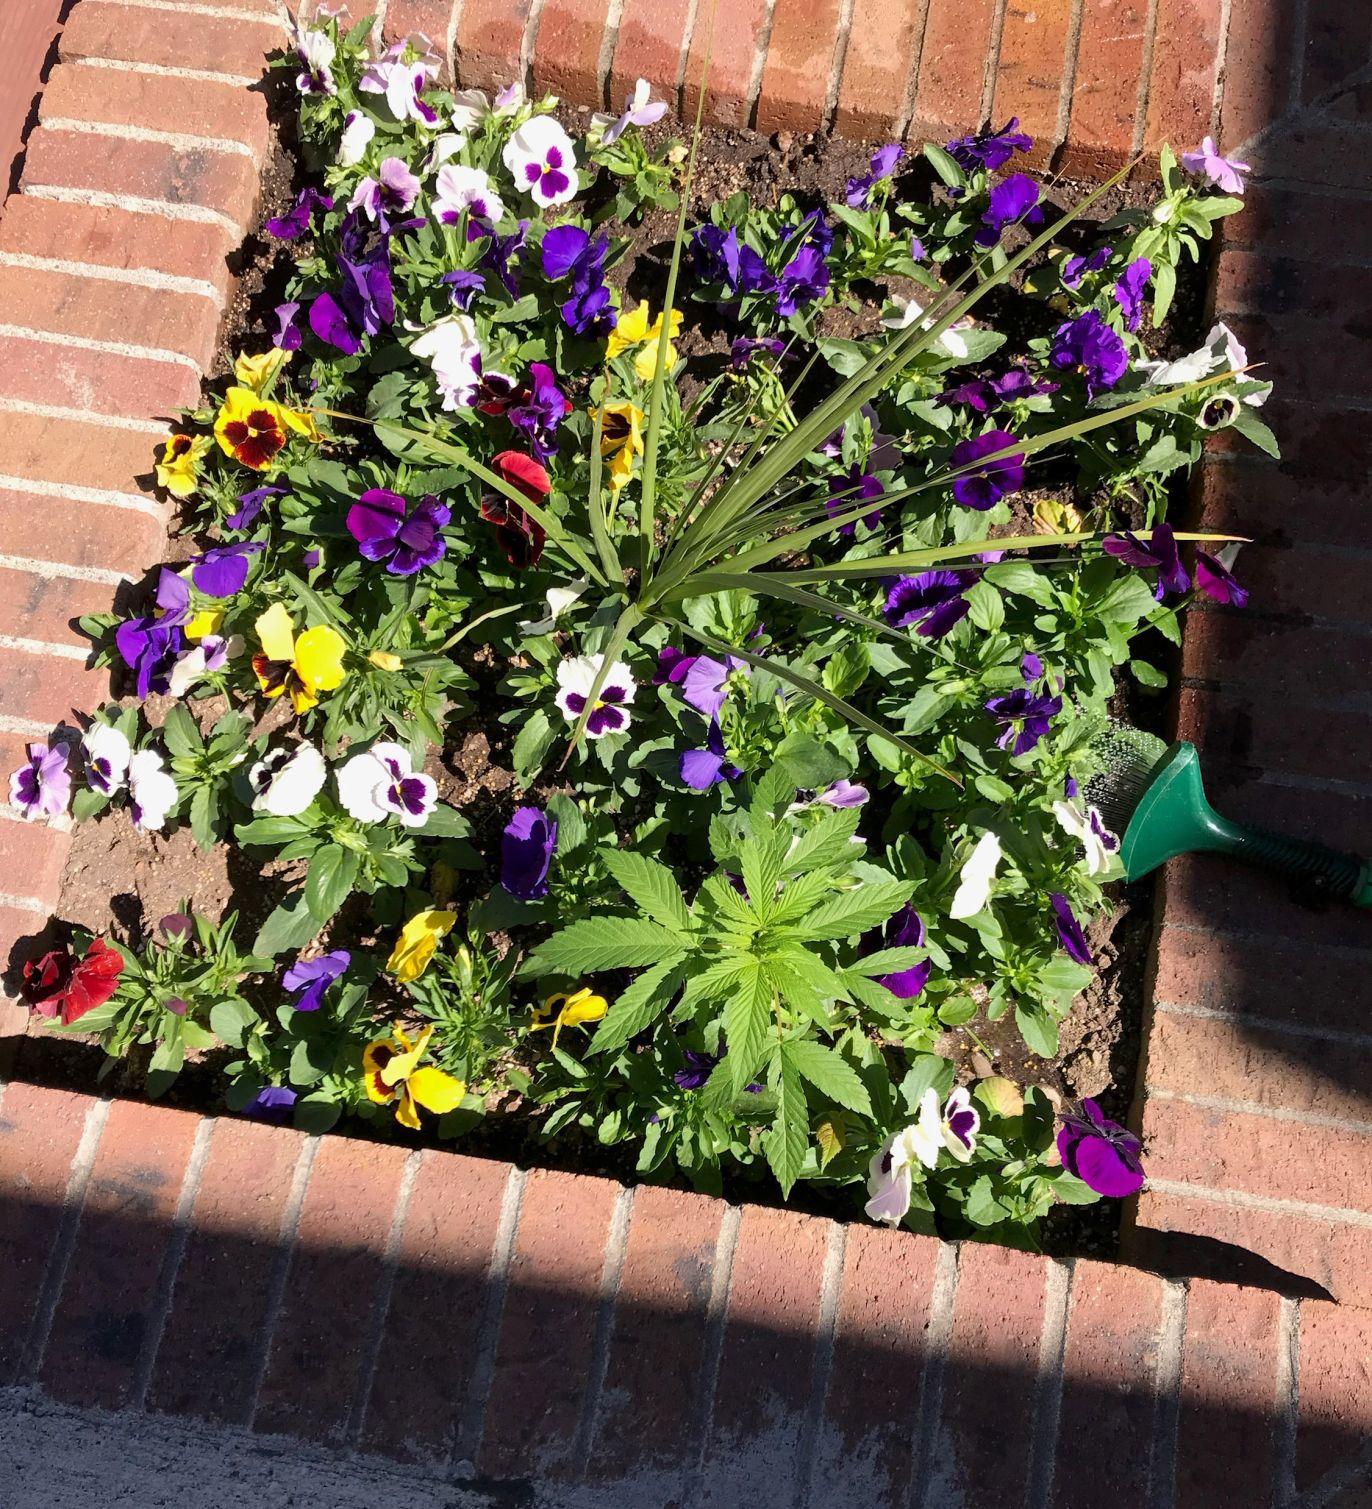 The Billings Gazette & Prankster plants marijuana in Wyoming town\u0027s flower pots ...